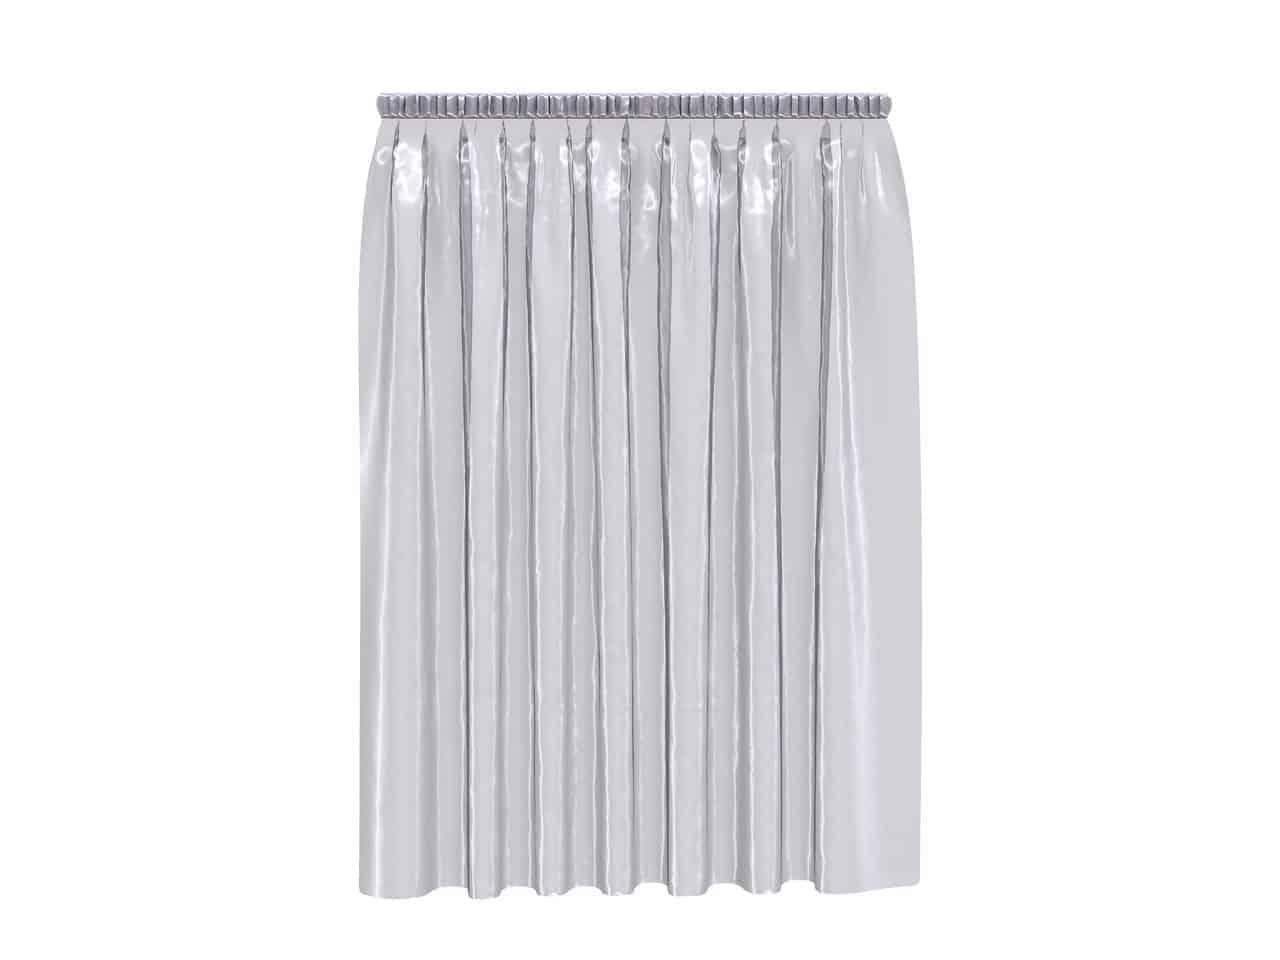 standard shower curtain sizes a